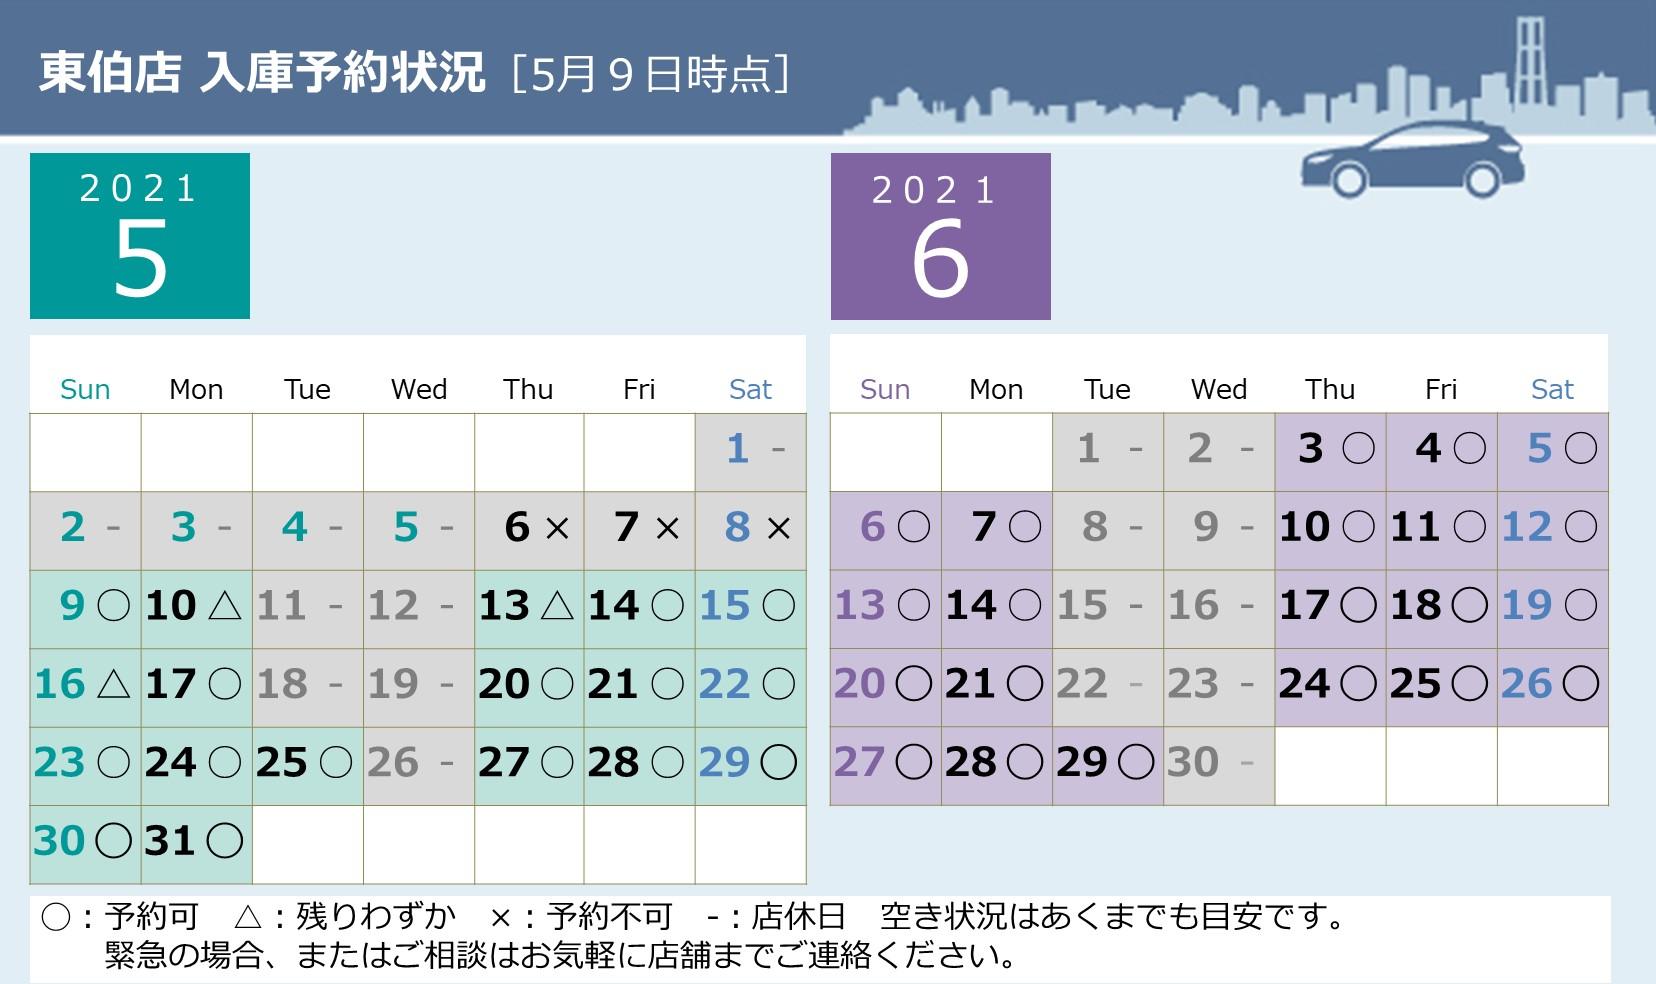 SUBARU SMILE DAY 15・16日が最終です!!